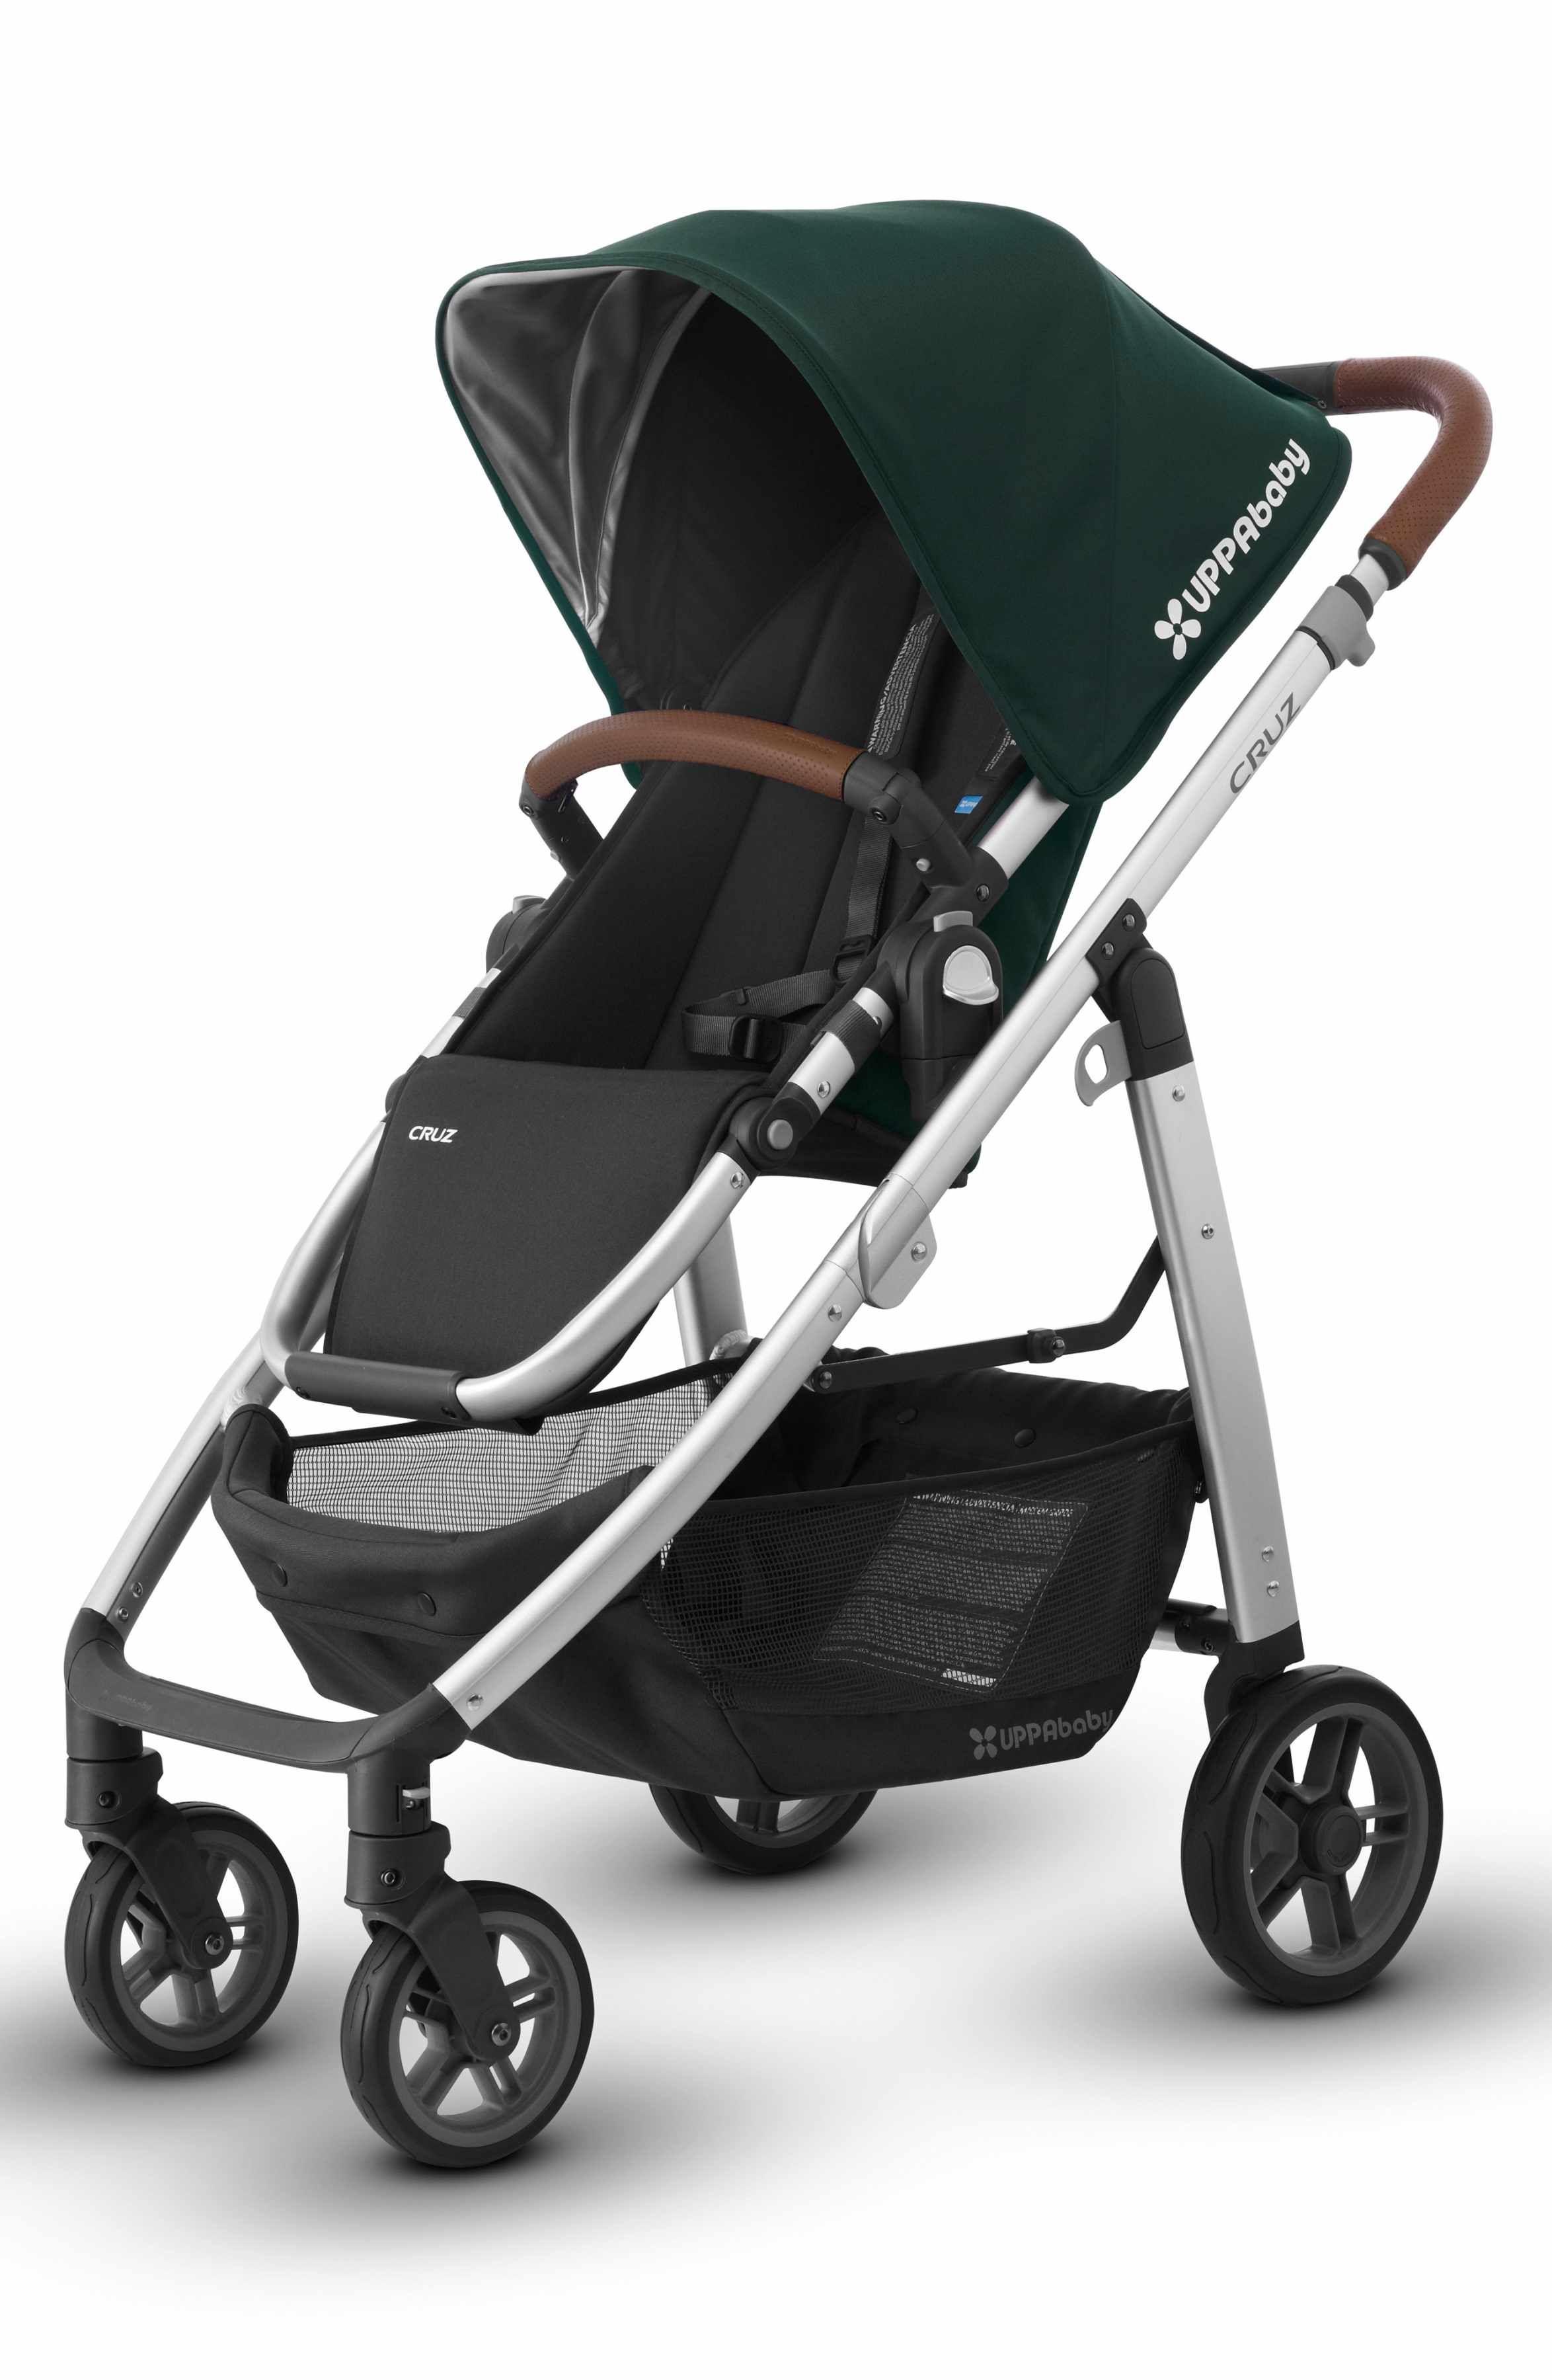 Main Image UPPAbaby 2017 CRUZ Aluminum Frame Stroller